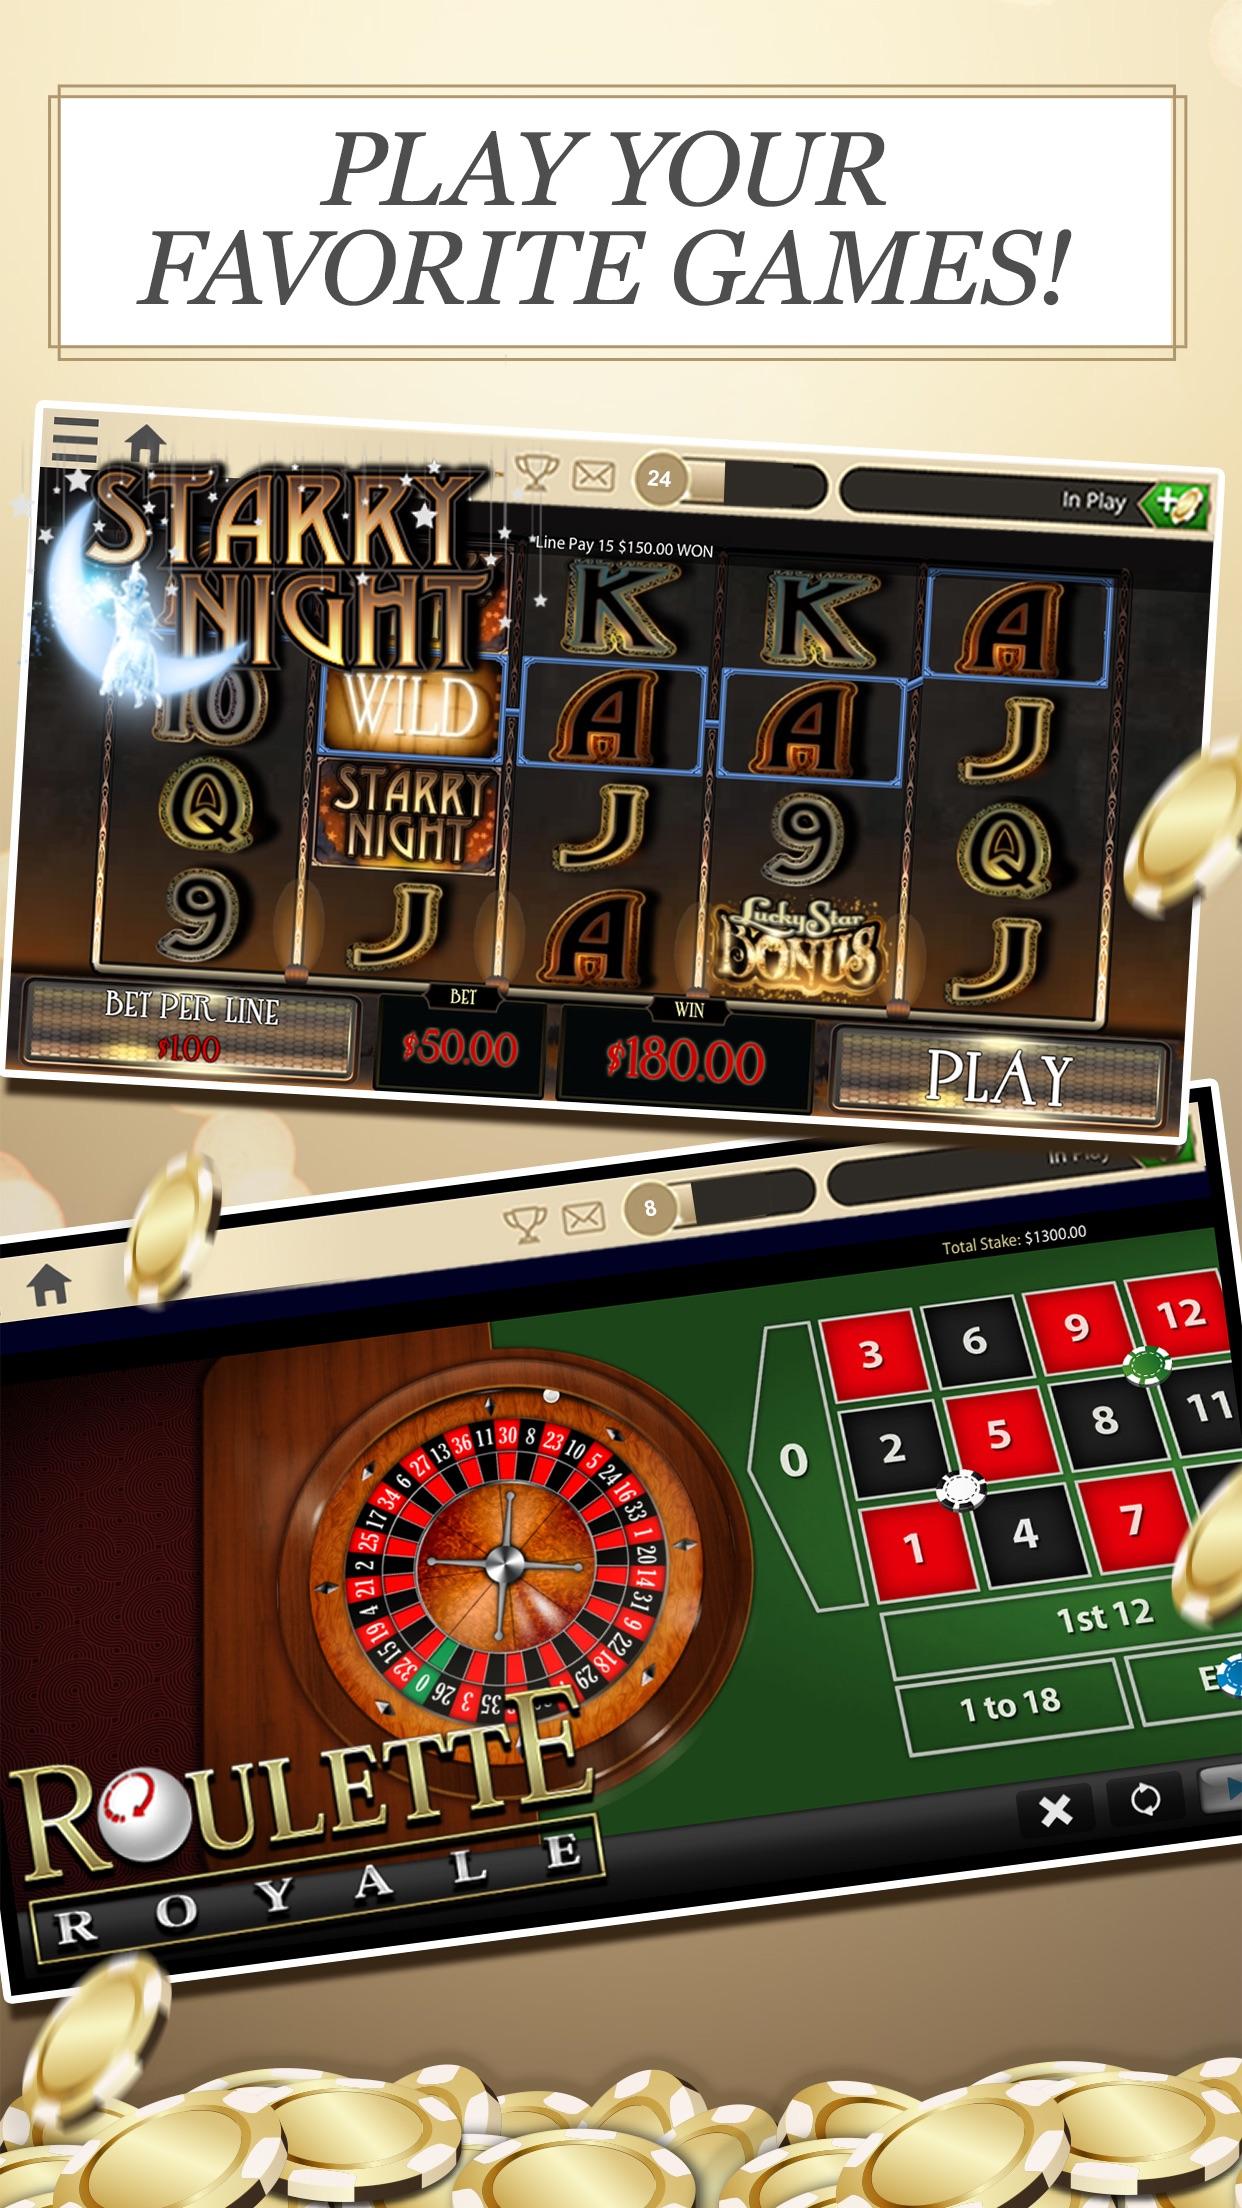 Roulette Casino Poker 4 In 1 Weco Turning Stone Casino